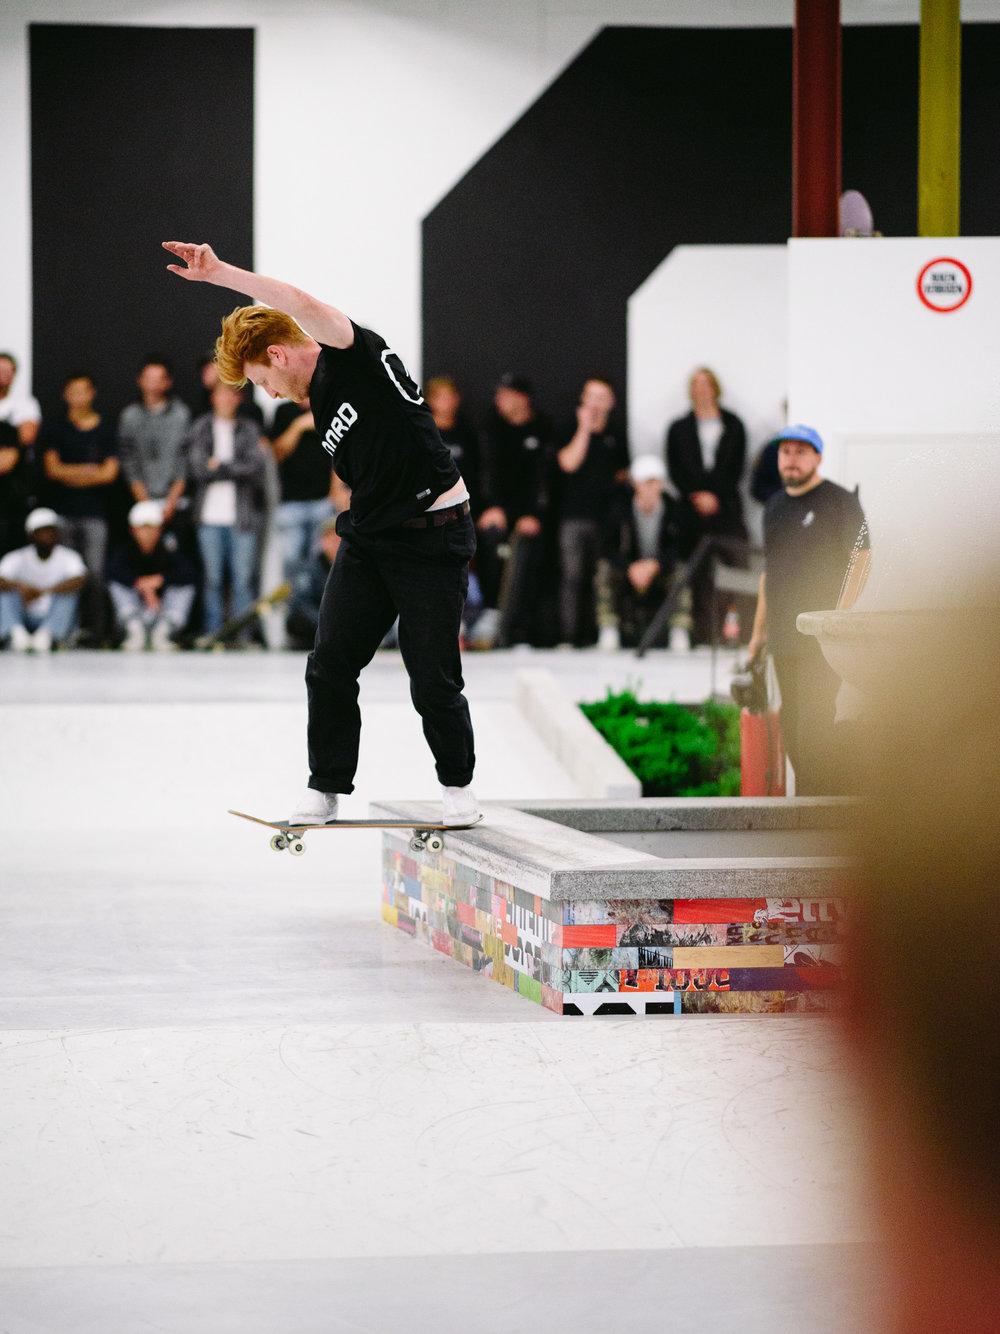 _IHC1853e-Nike-SB-Noord-Demo-Amsterdam-July-2017-Photographer-Maksim-Kalanep.jpg